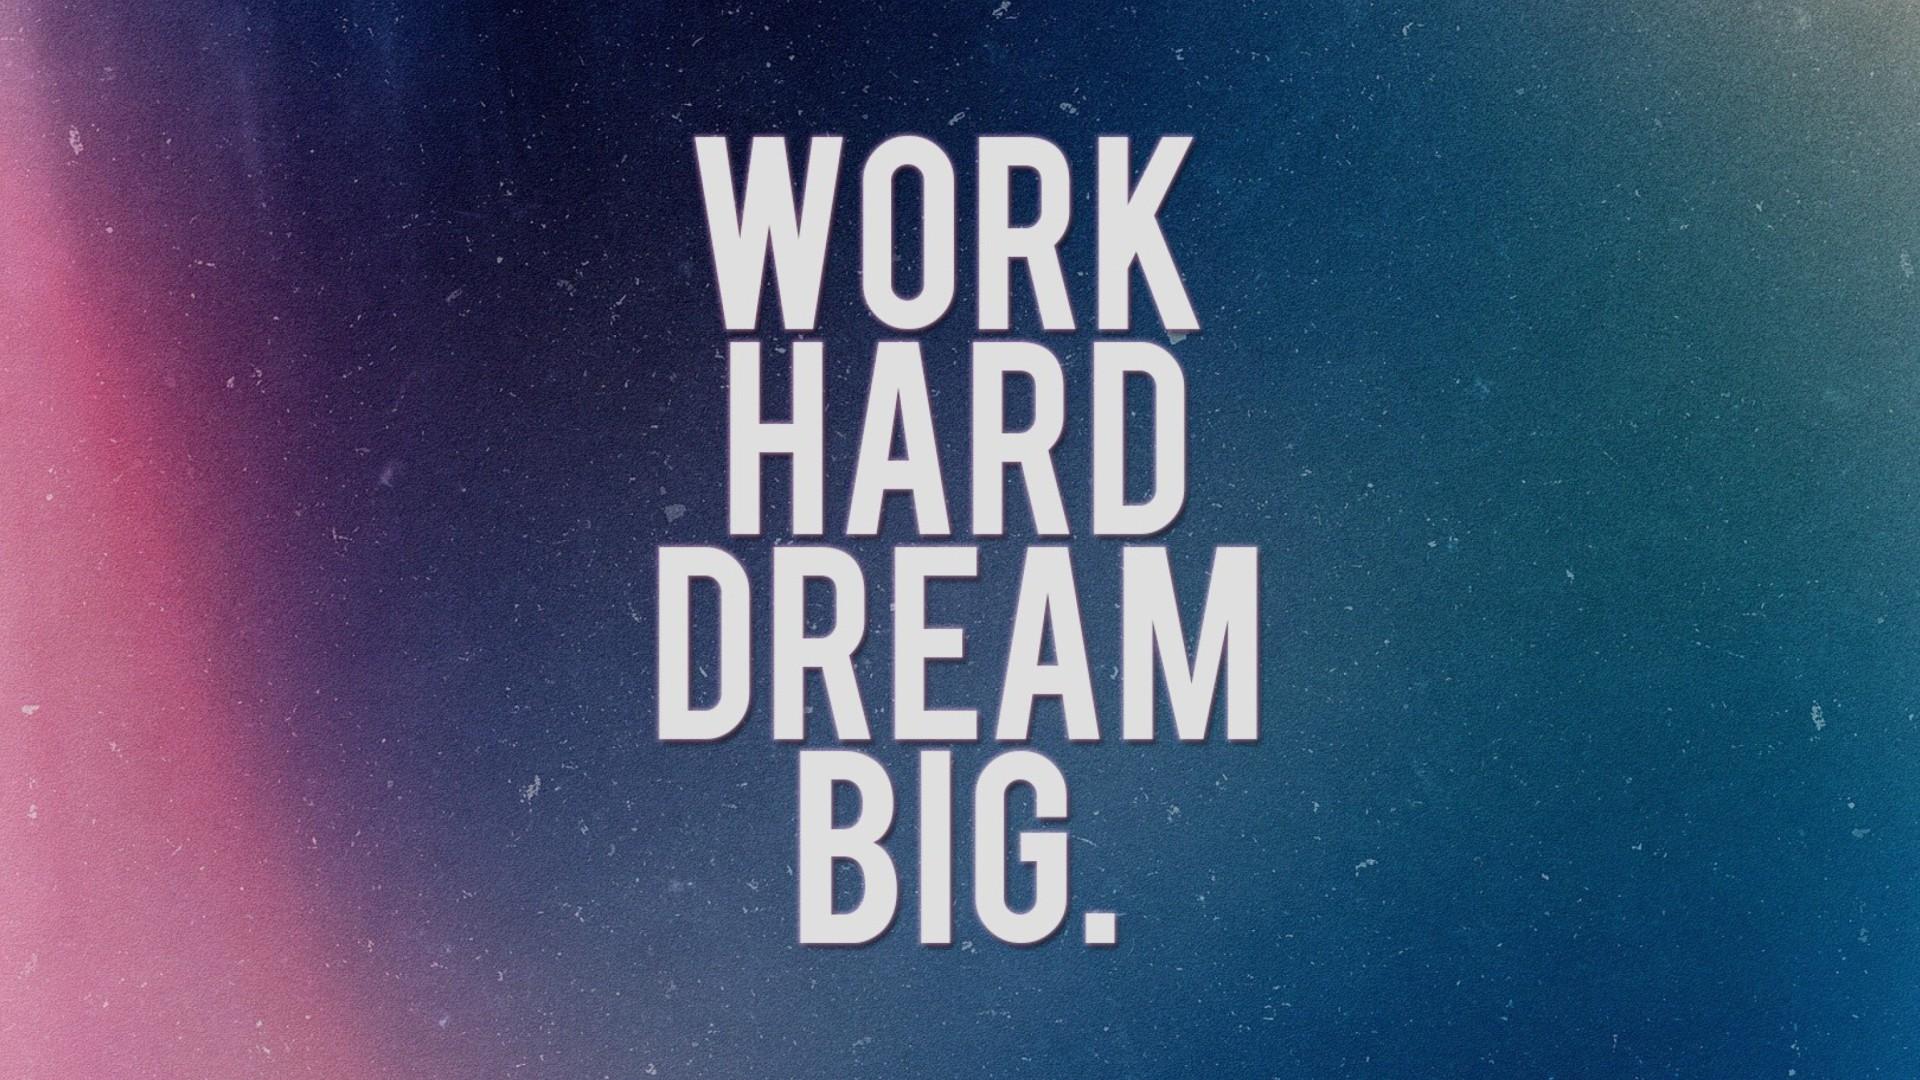 Motivational laptop background wallpaper